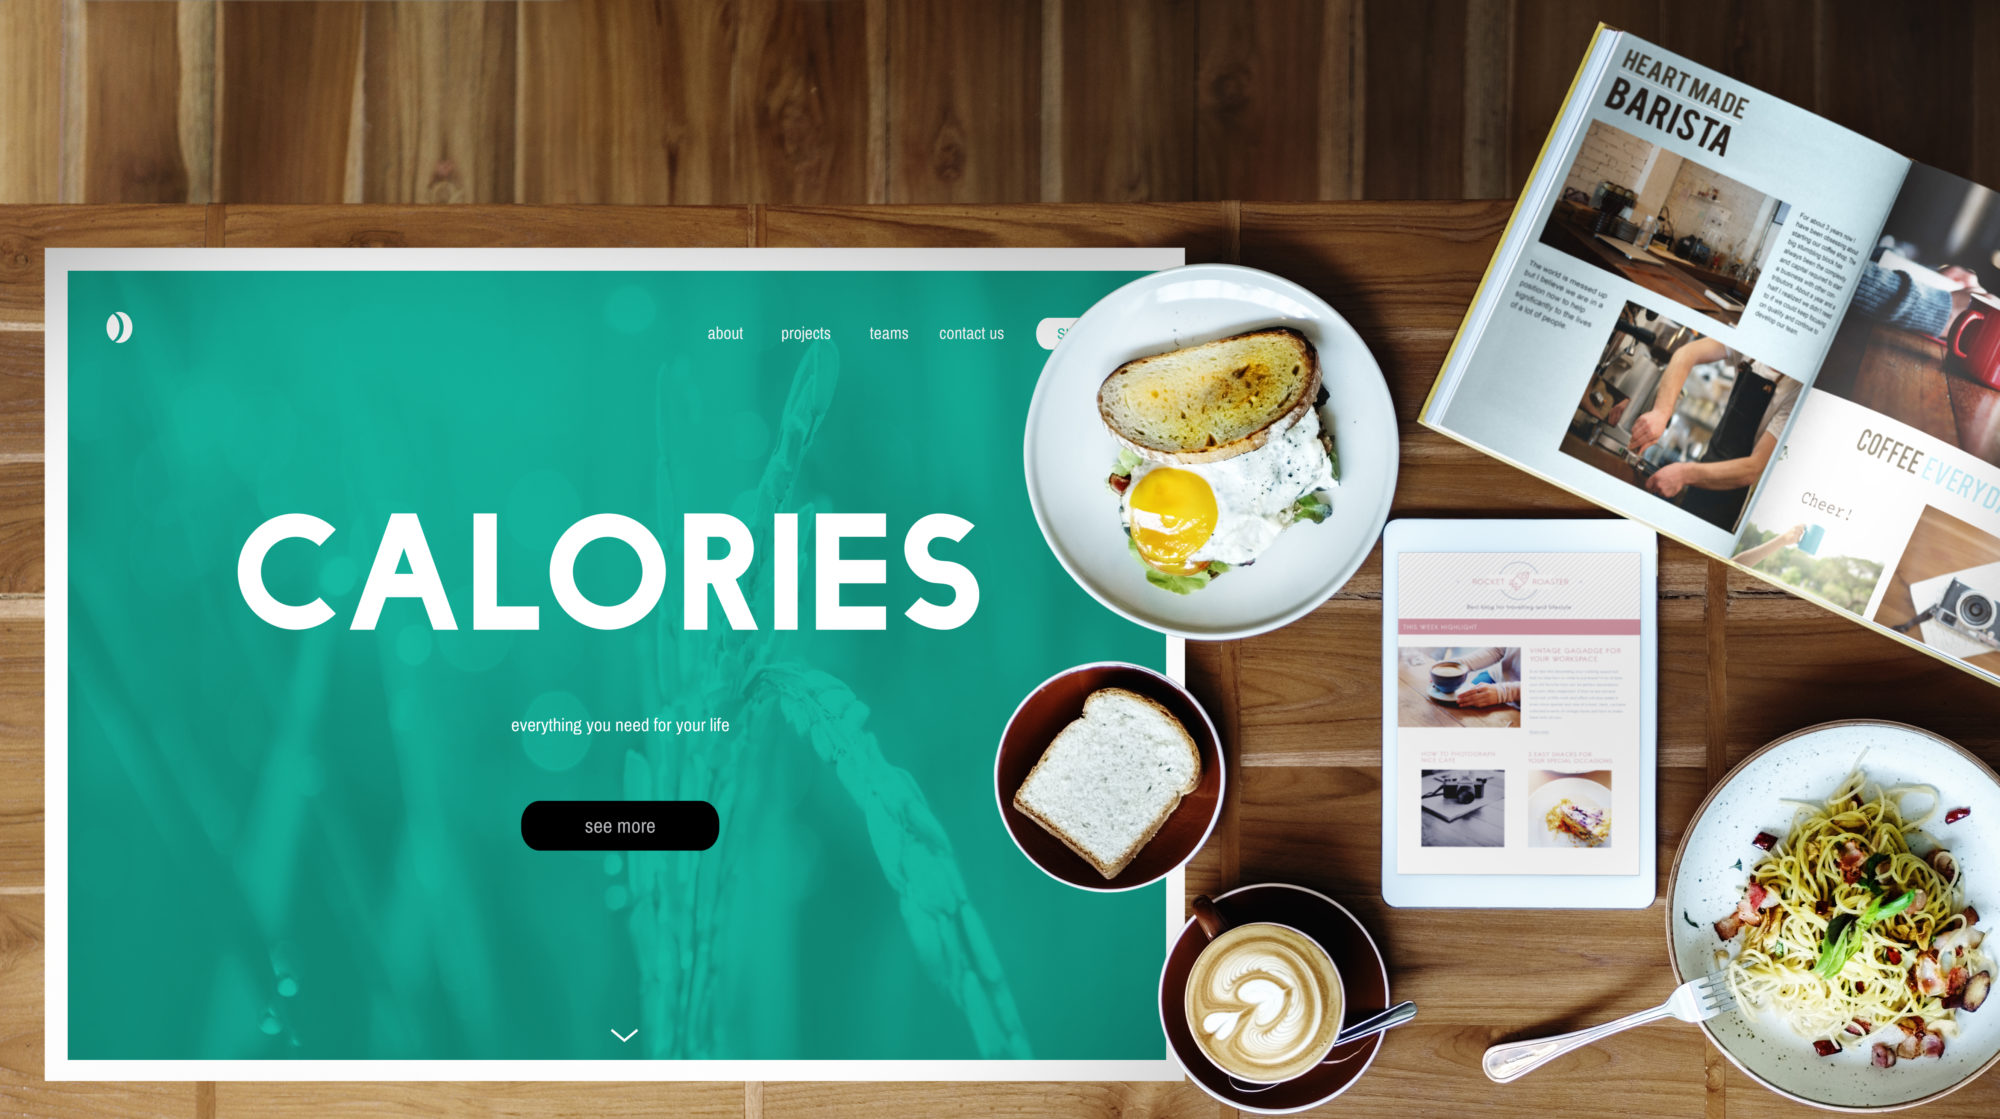 Da li nam je kalkulator kalorija neophodan?